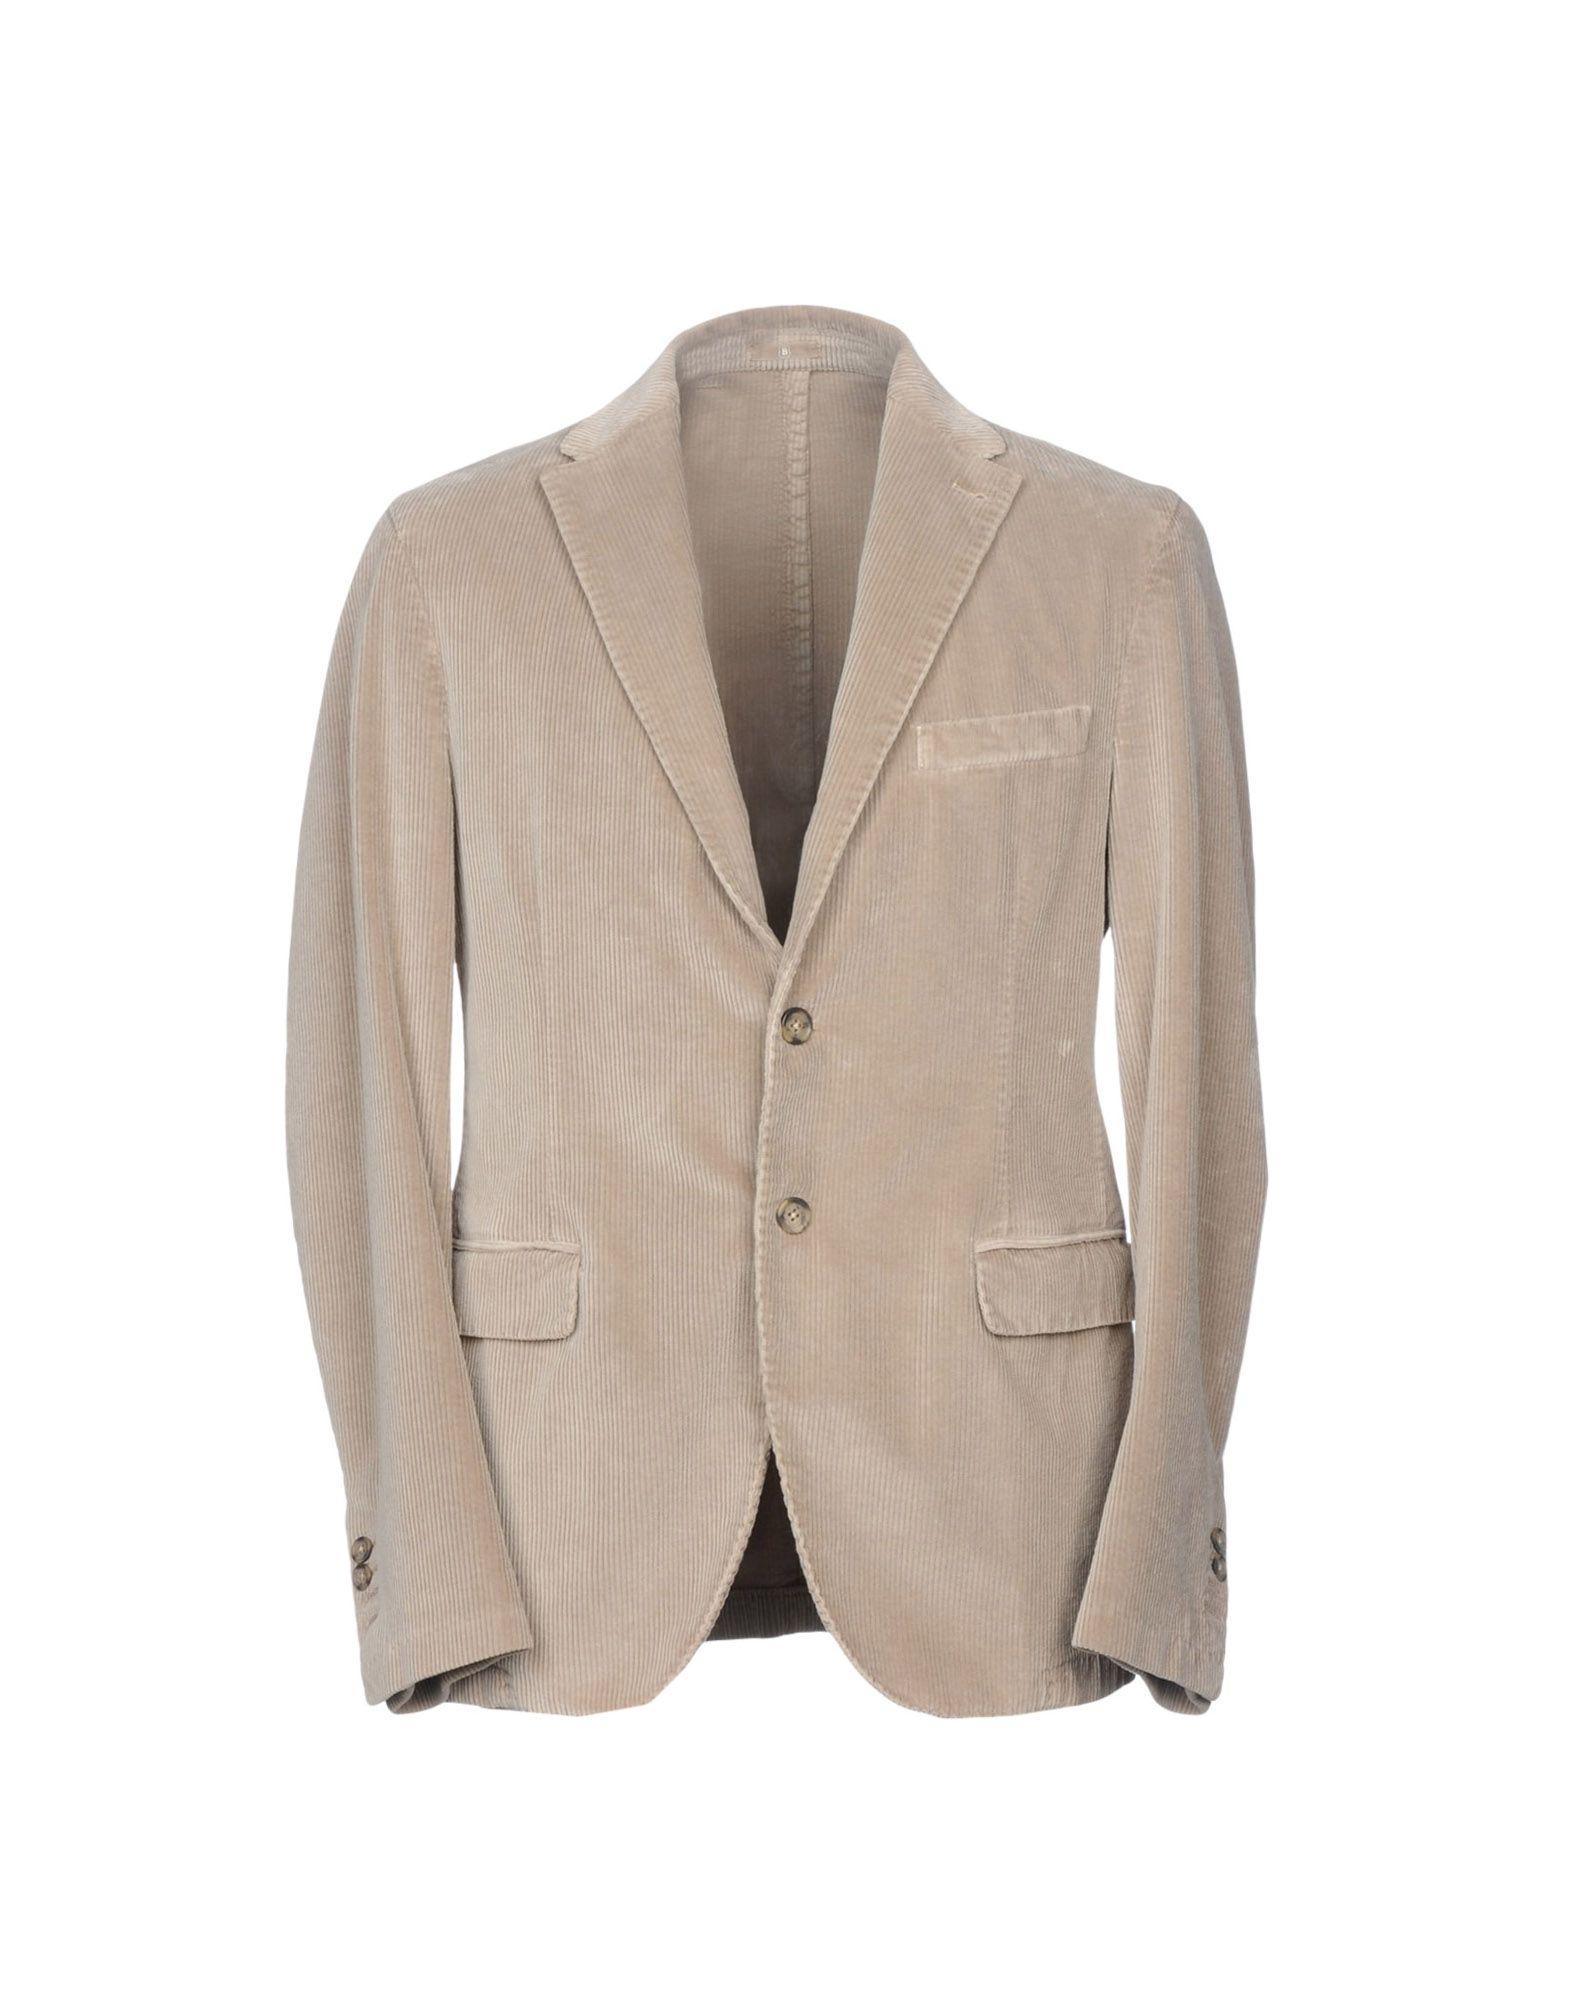 BREUER Blazer in Light Grey